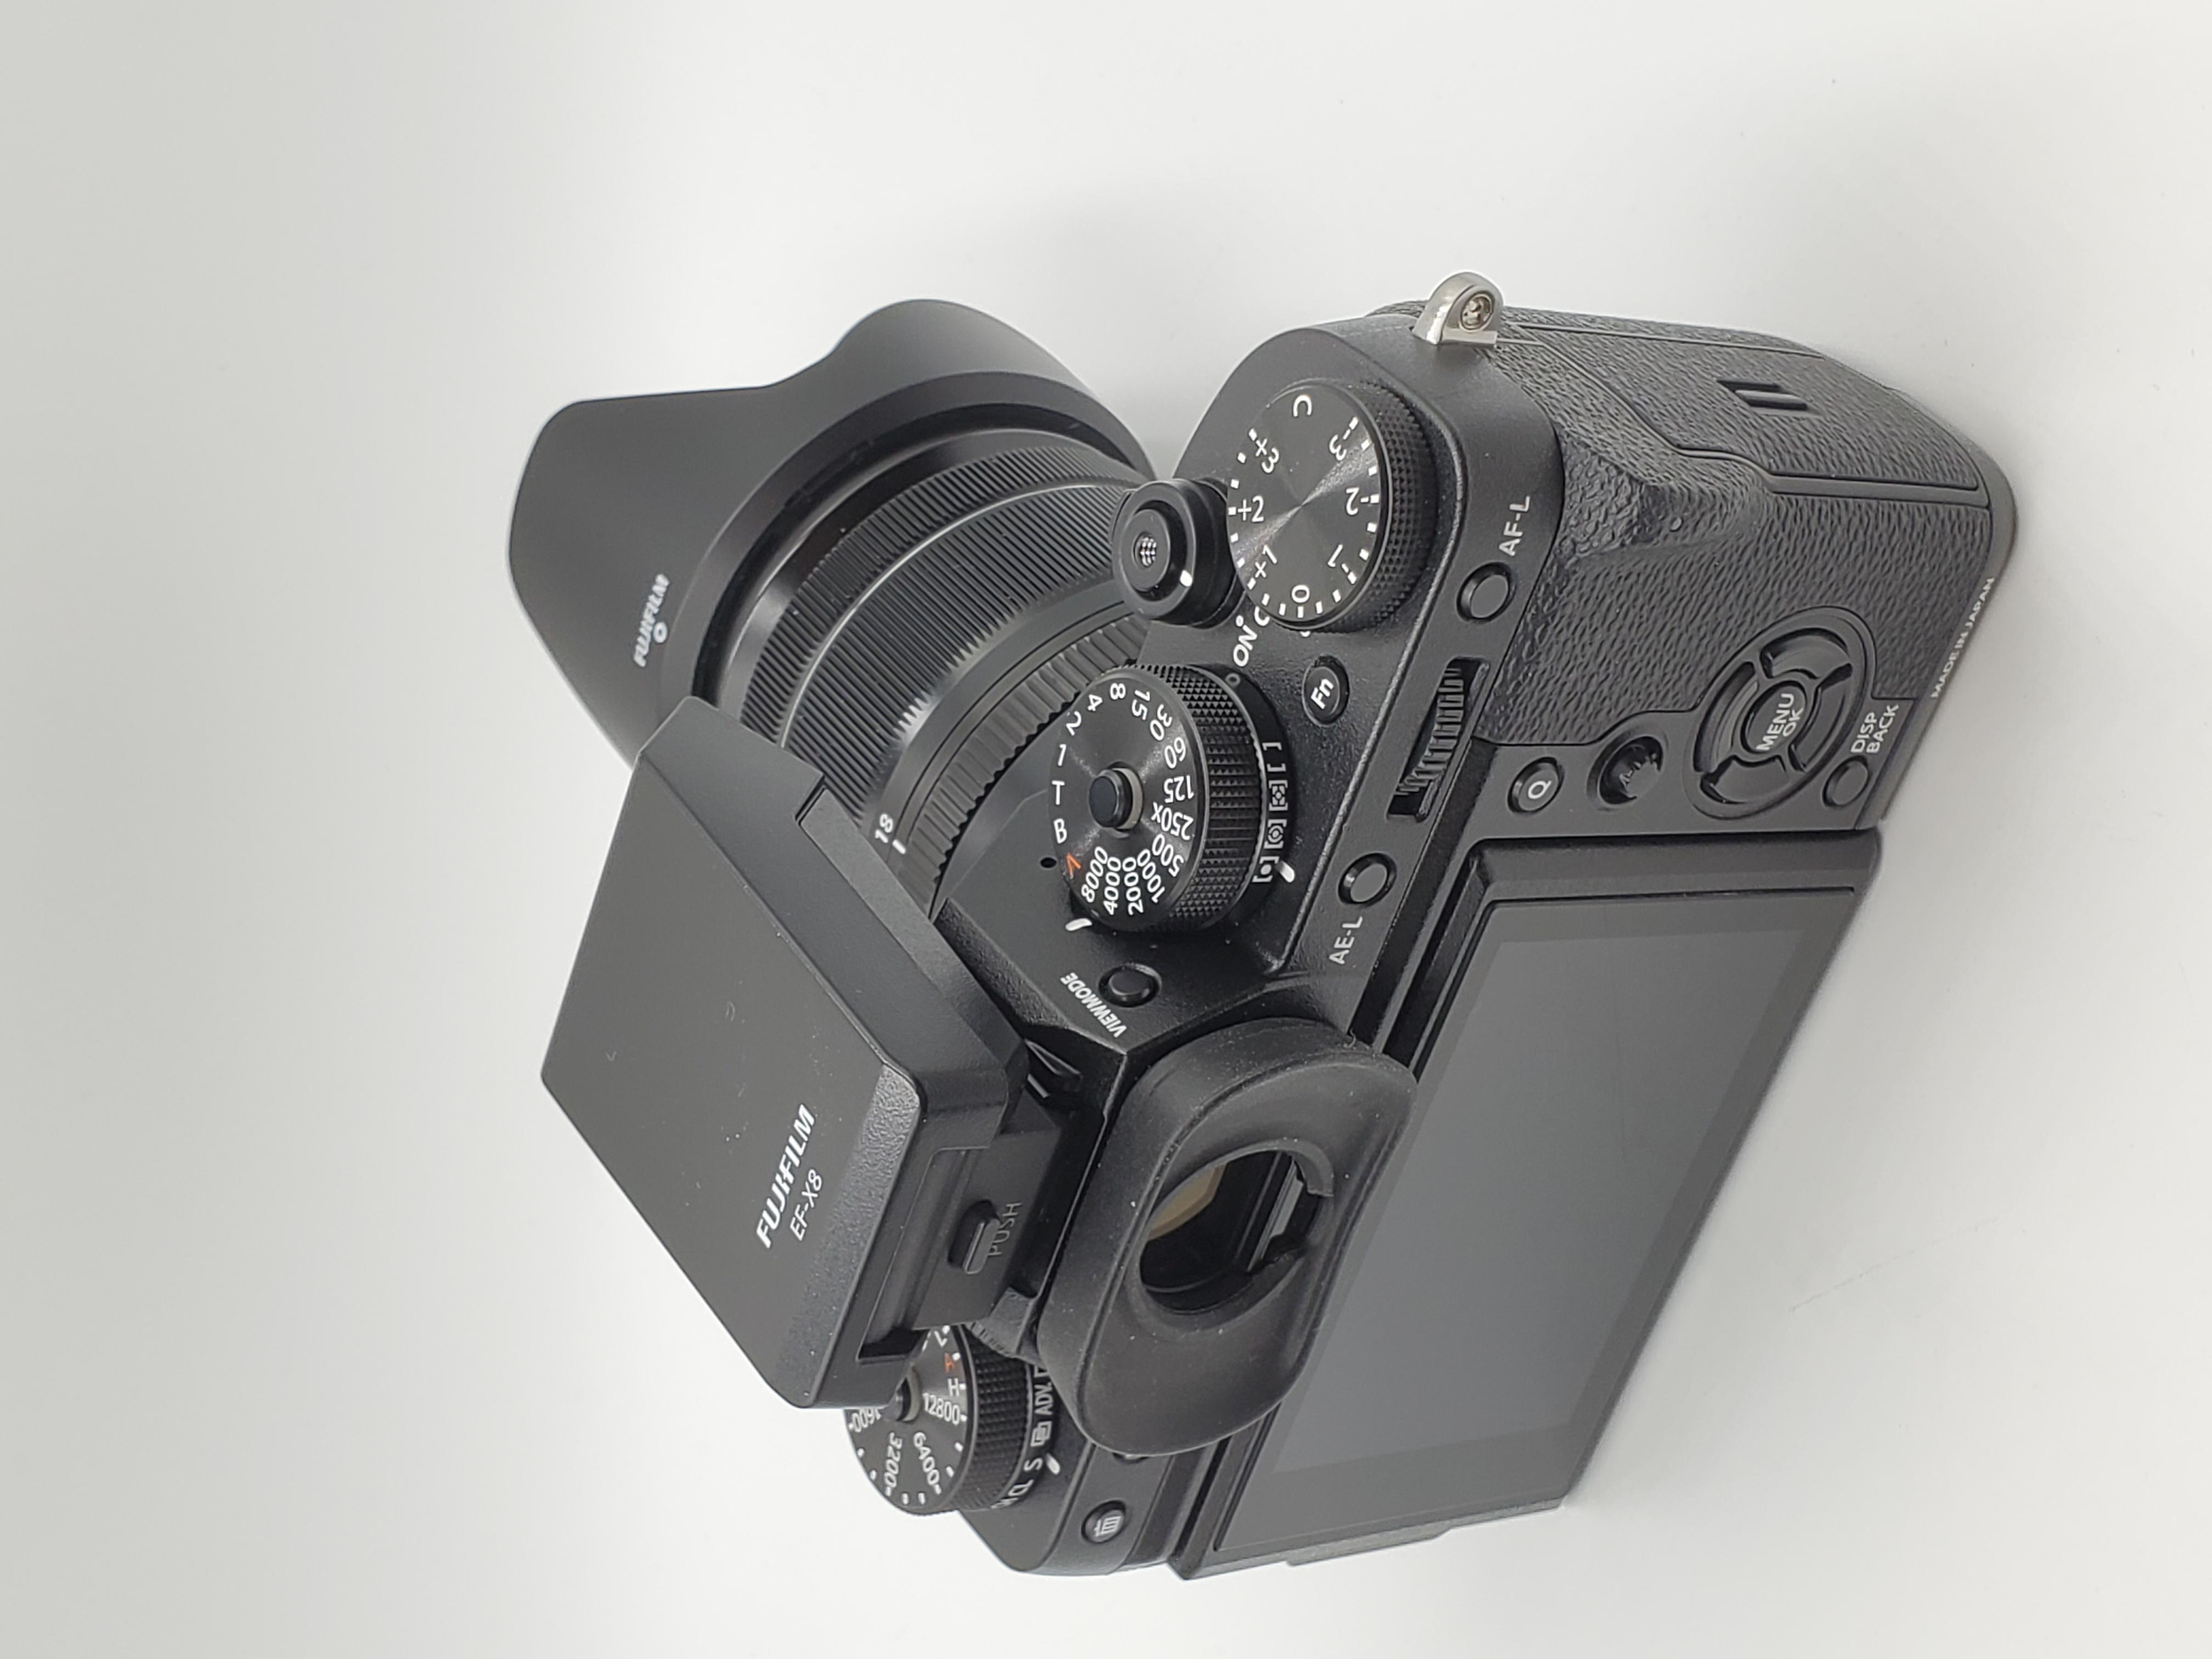 USED Fujifilm X-T2 Mirrorless Digital Camera Kit with XF18-55mm Lens